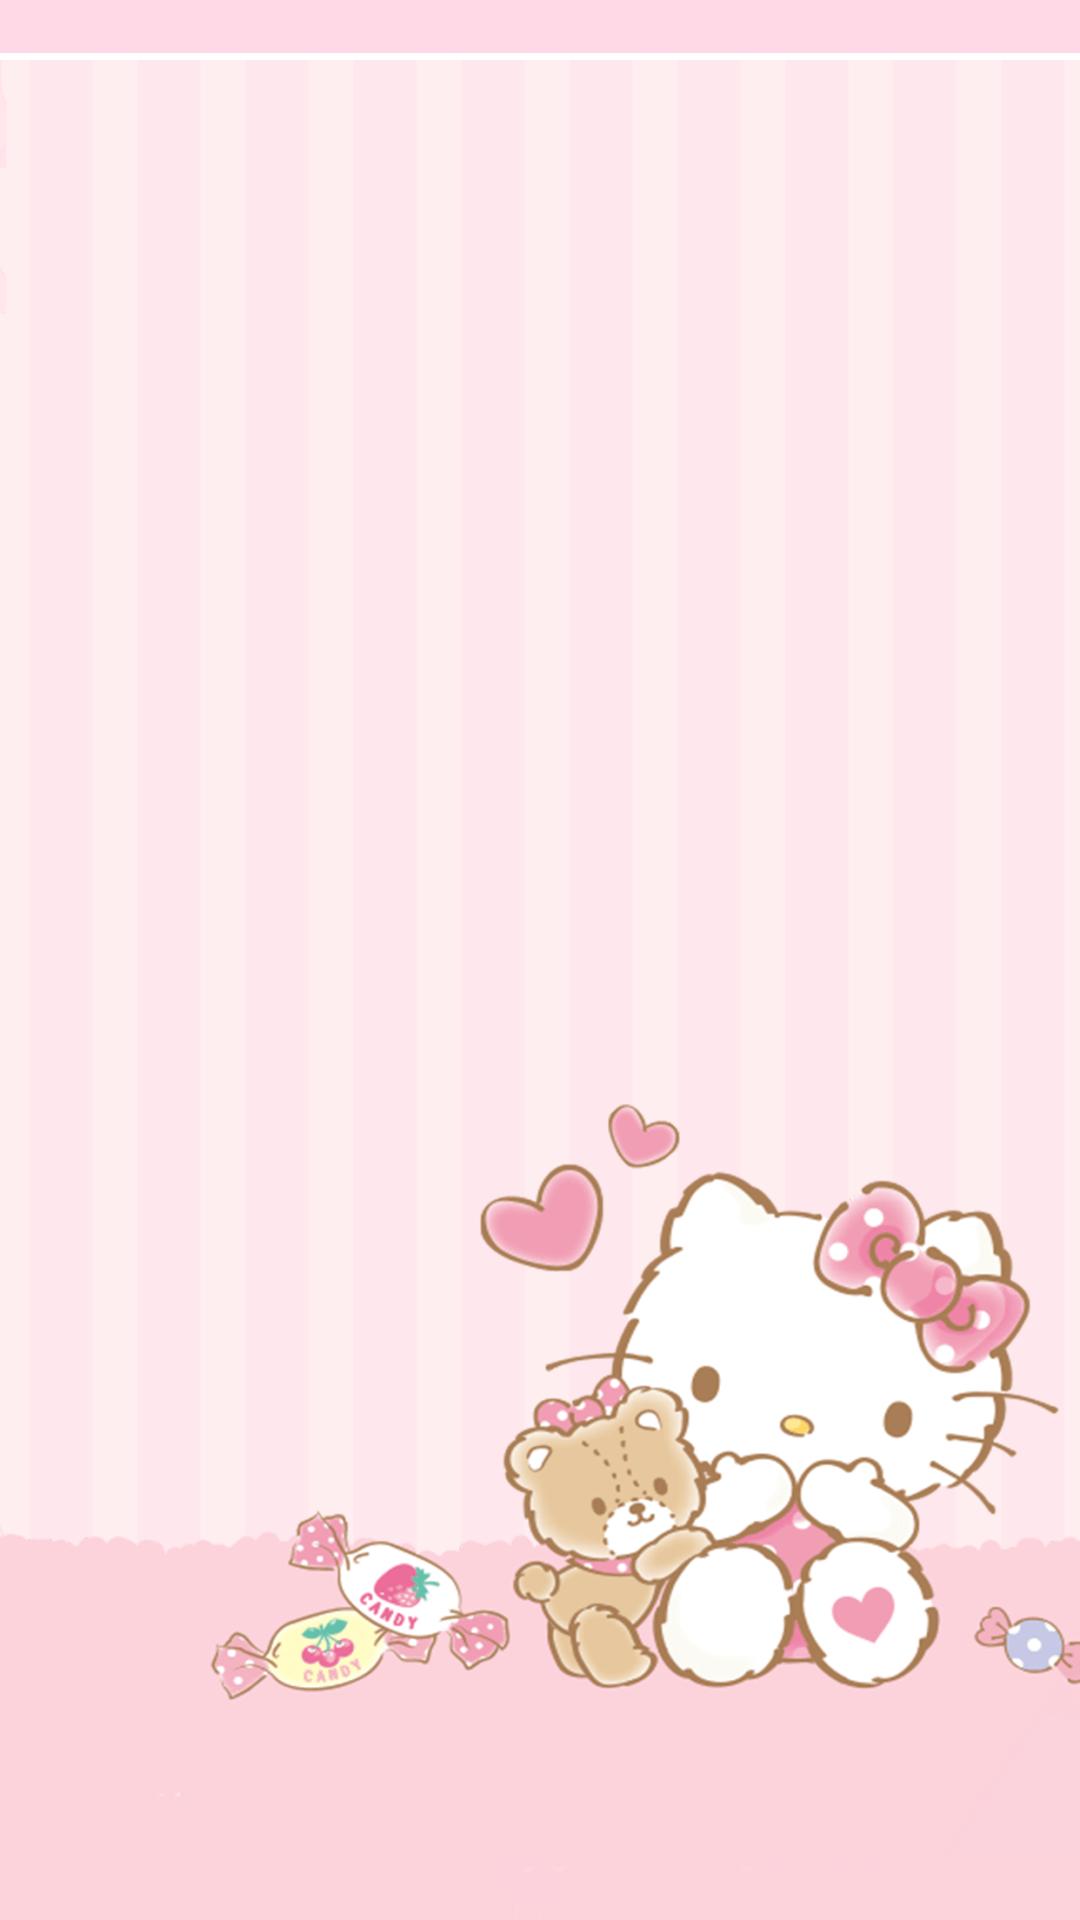 Girly Hello Kitty Wallpapers Top Free Girly Hello Kitty